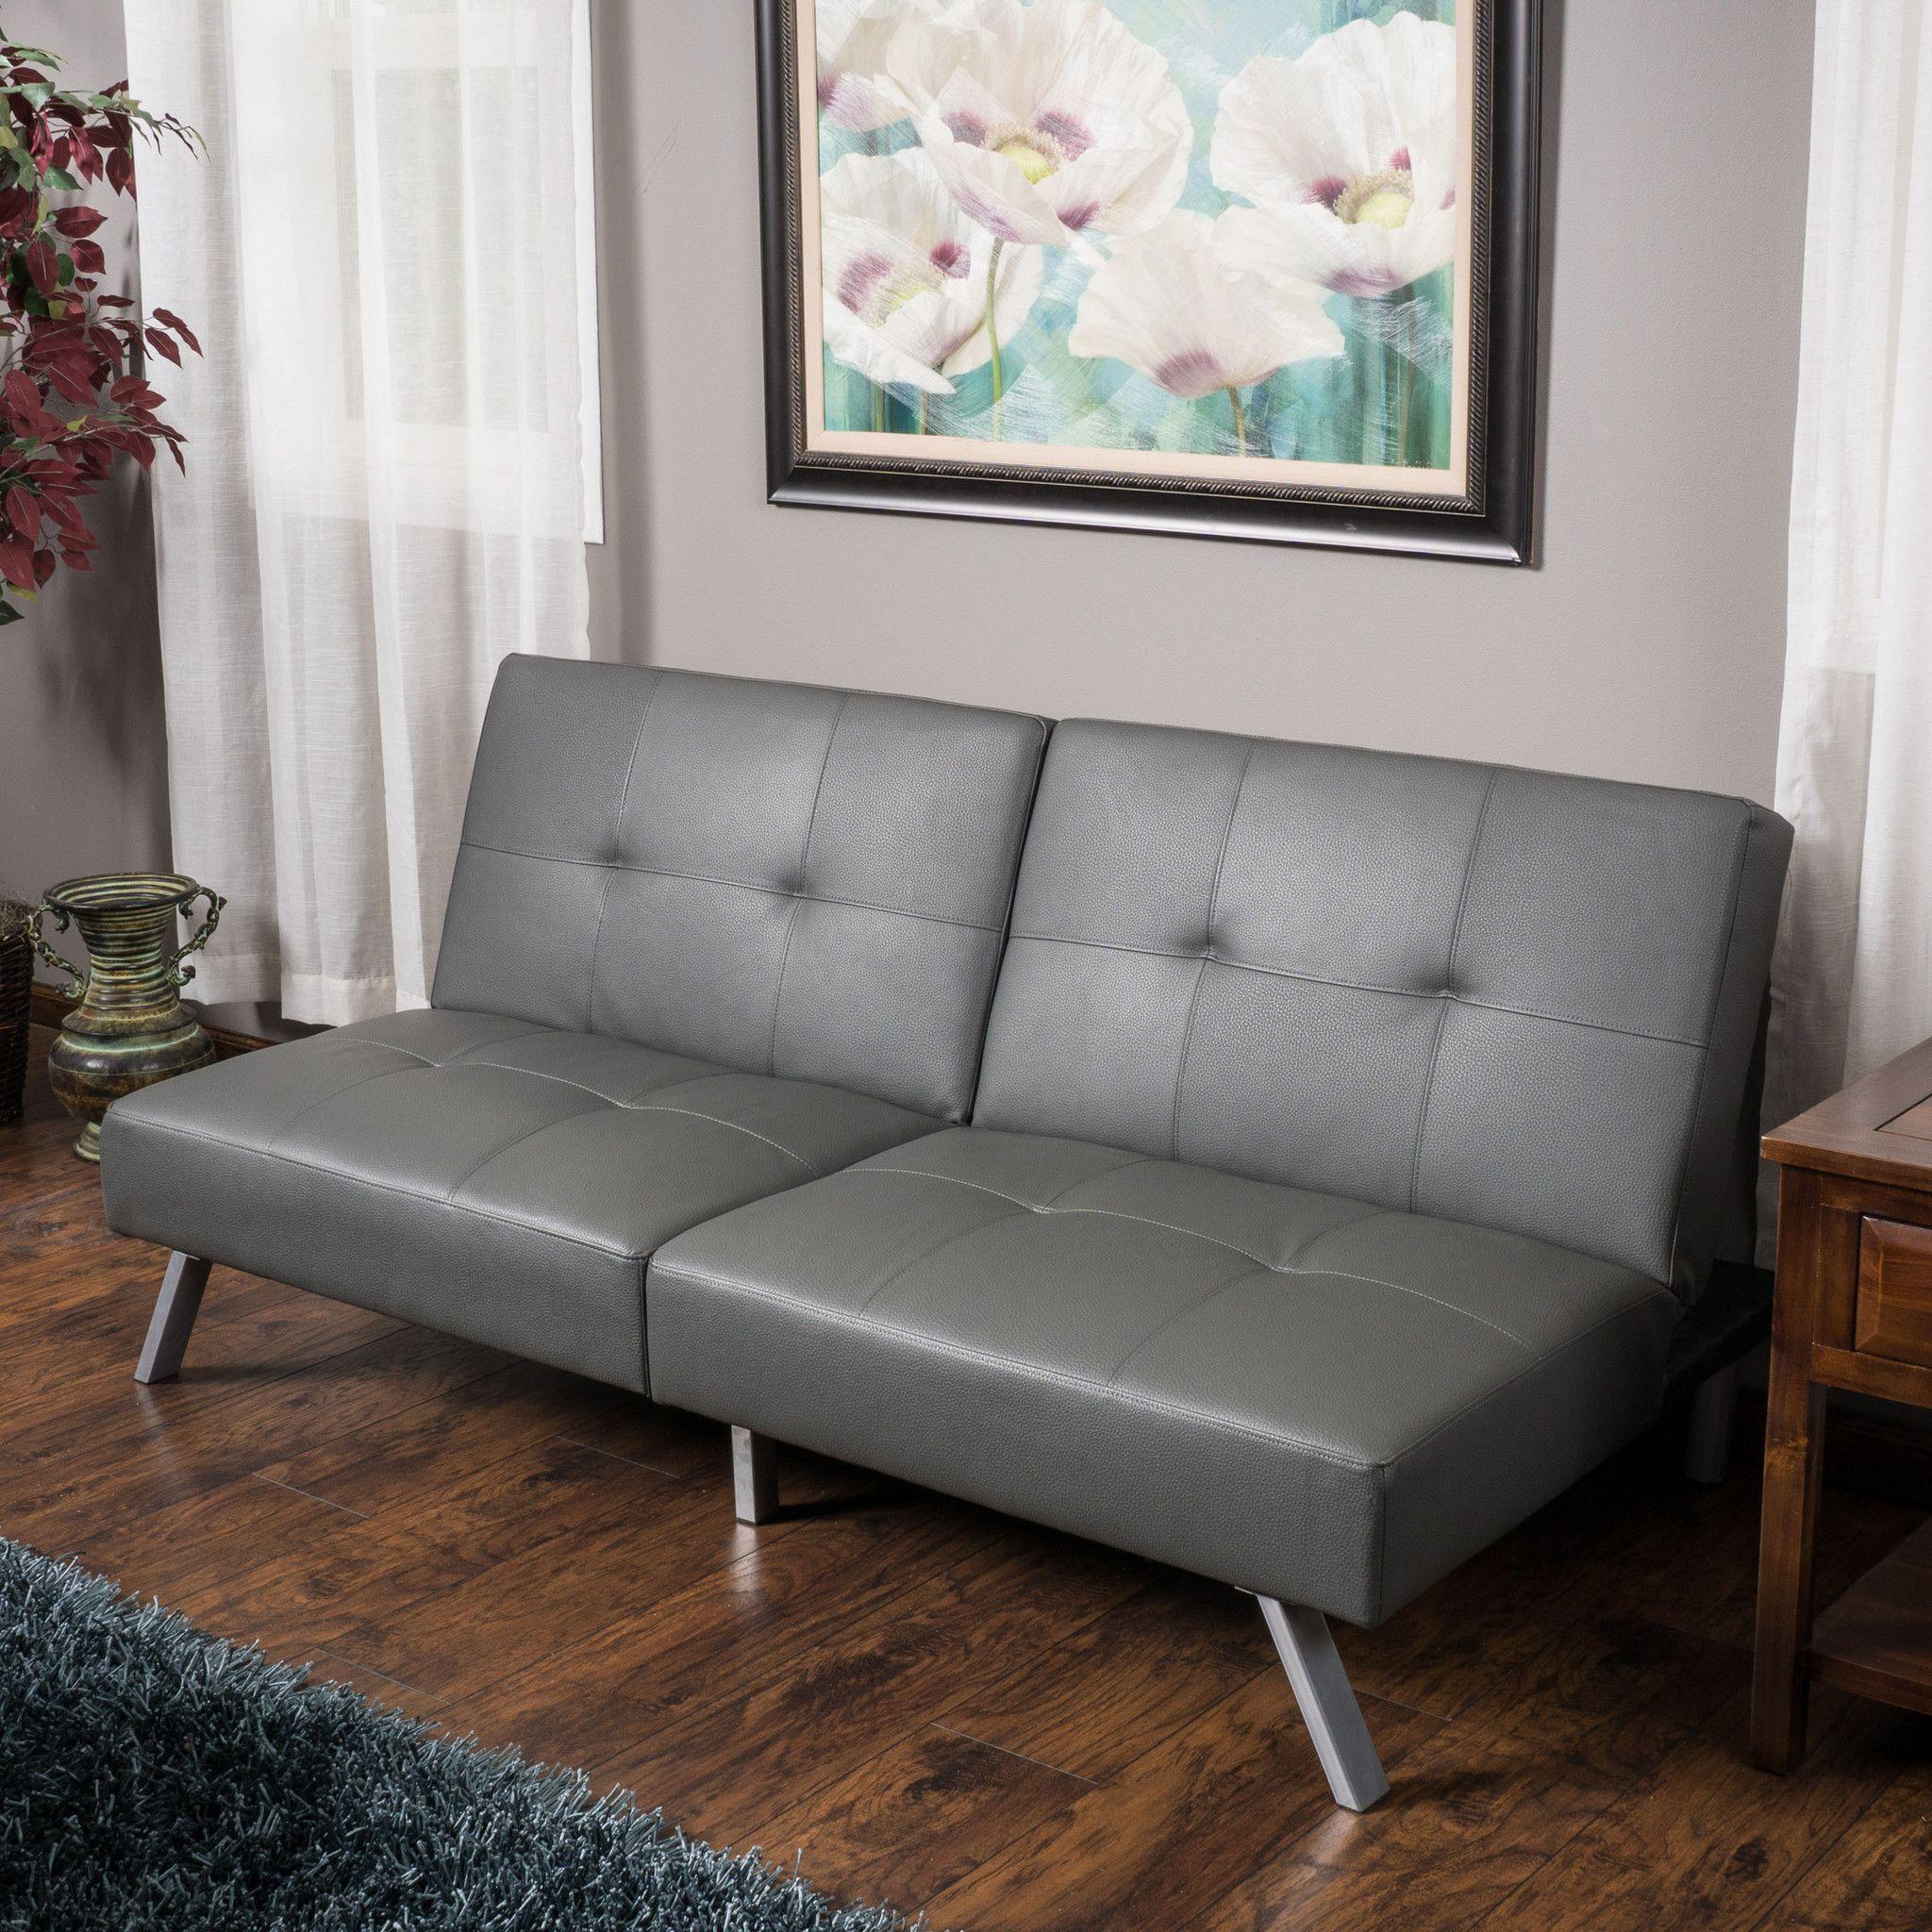 Heston Grey Vinyl Click Clack Futon Sofa Bed Small